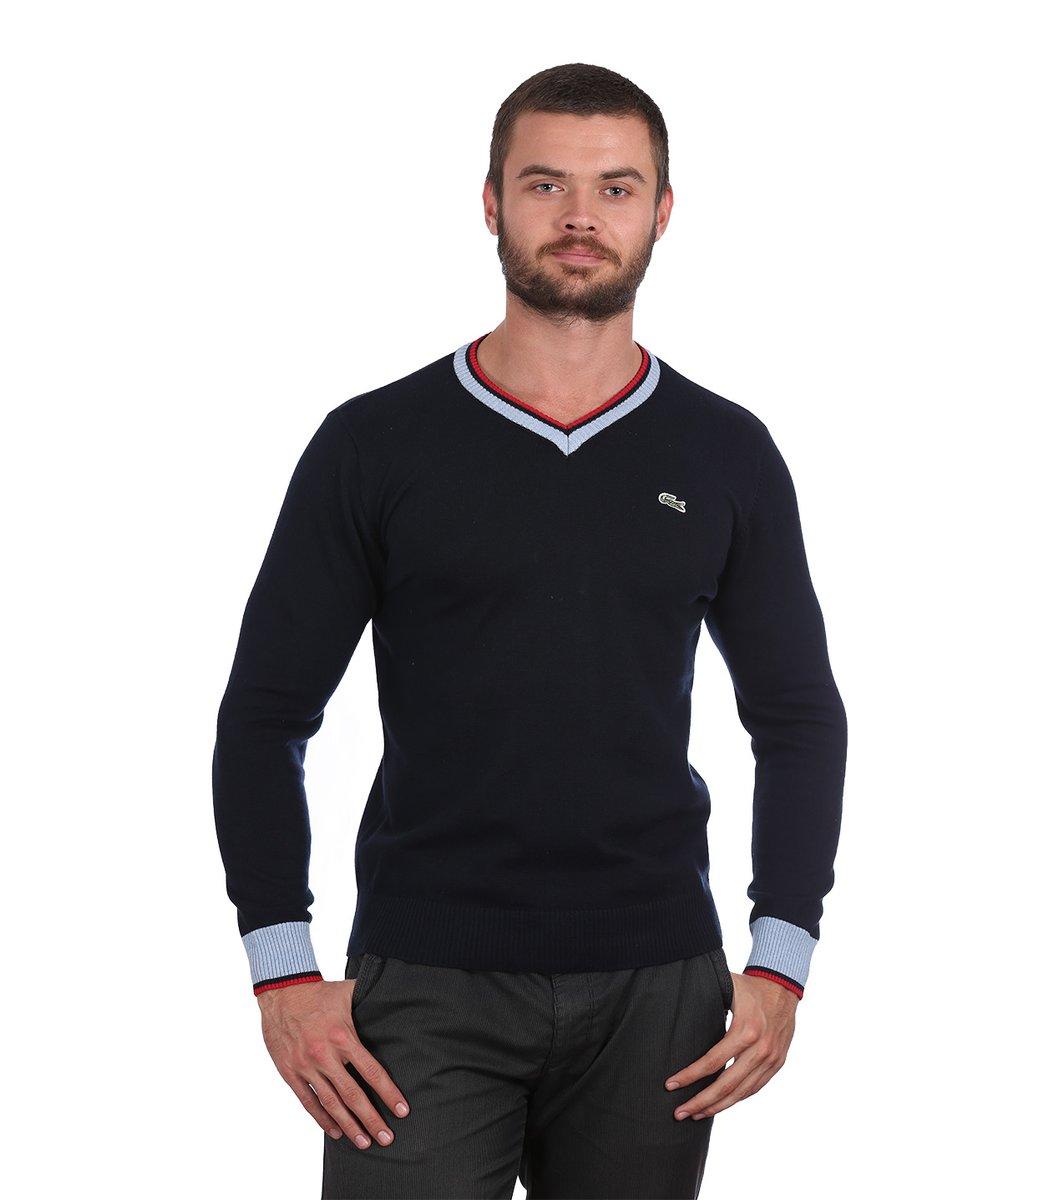 Пуловер Lacoste VL2 (Тёмно-синий)